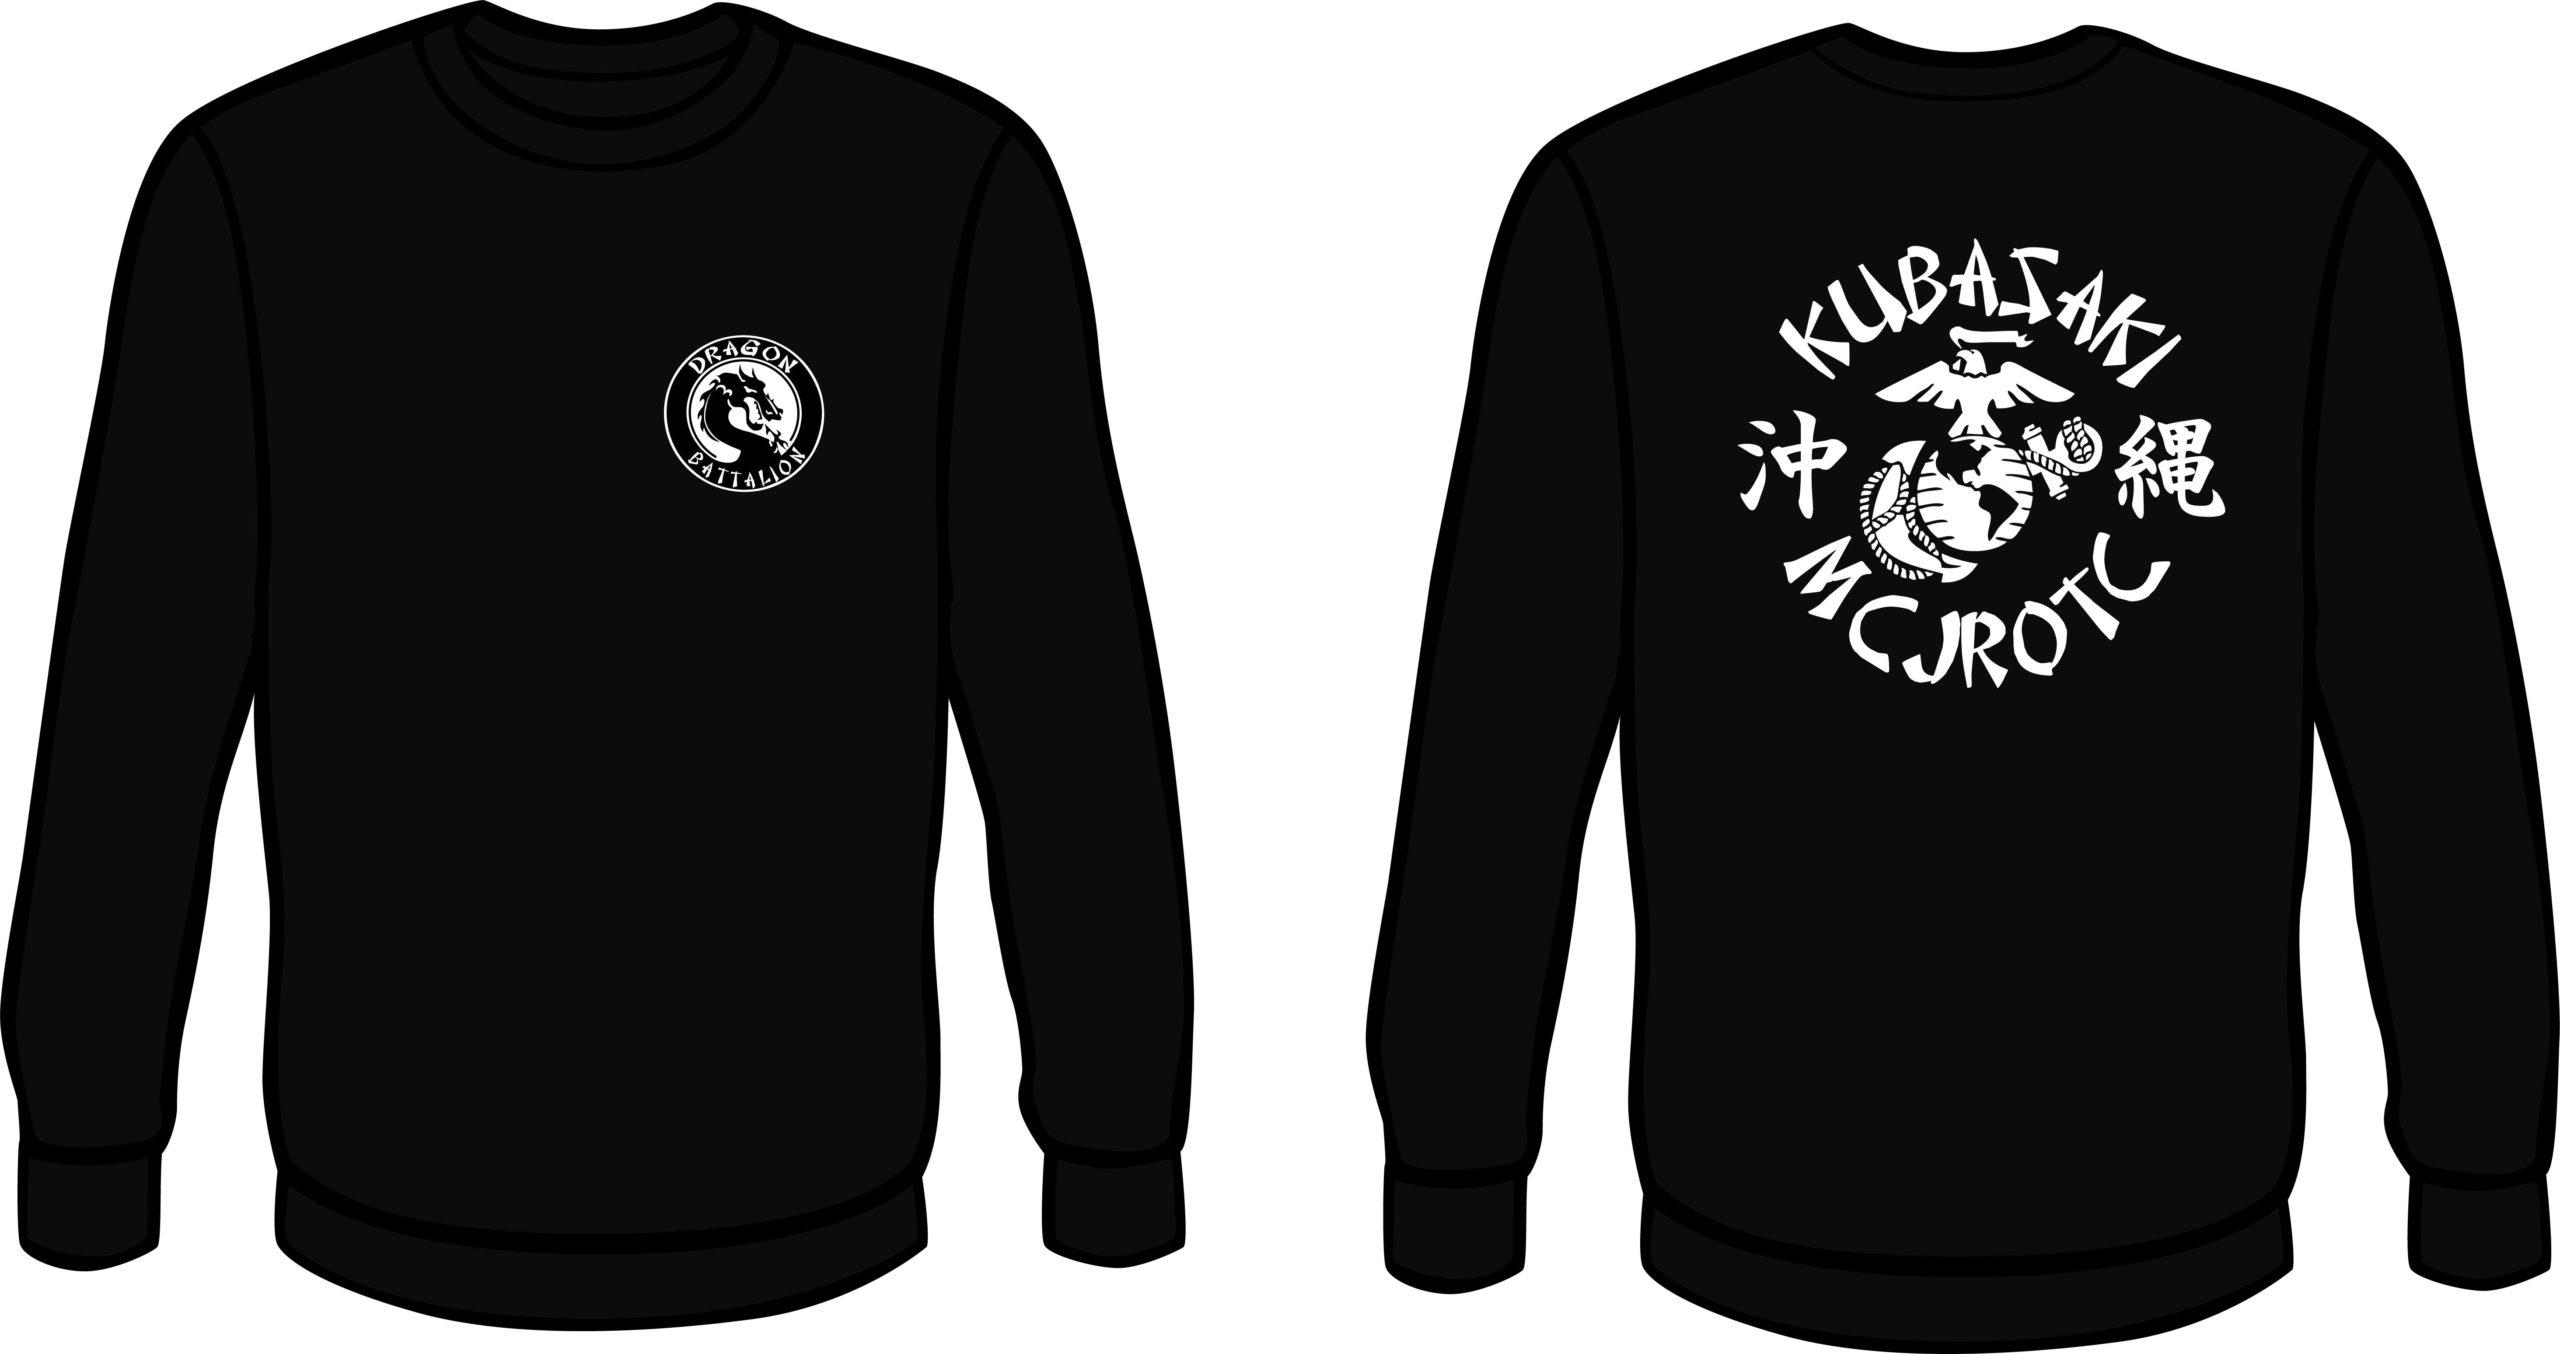 Black Crew Neck Sweat Shirt